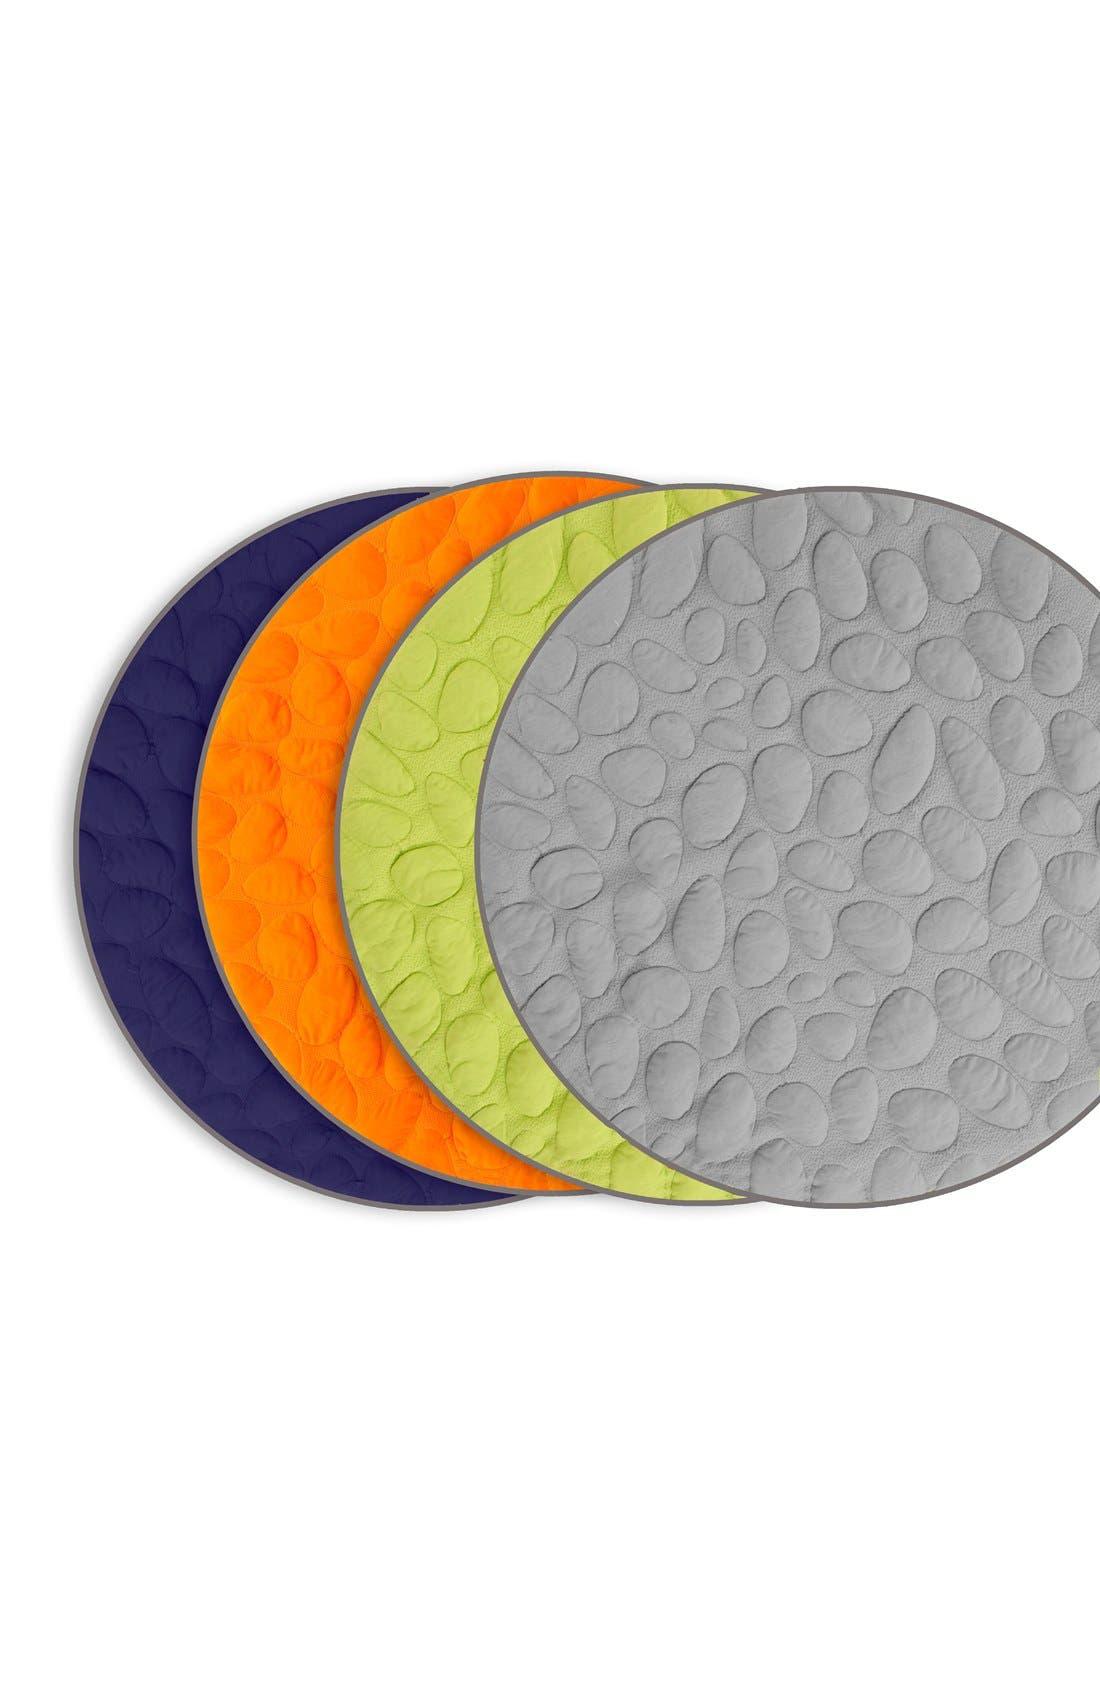 NOOK SLEEP SYSTEMS, 'Pebble LilyPad' Play Mat, Alternate thumbnail 5, color, LAWN